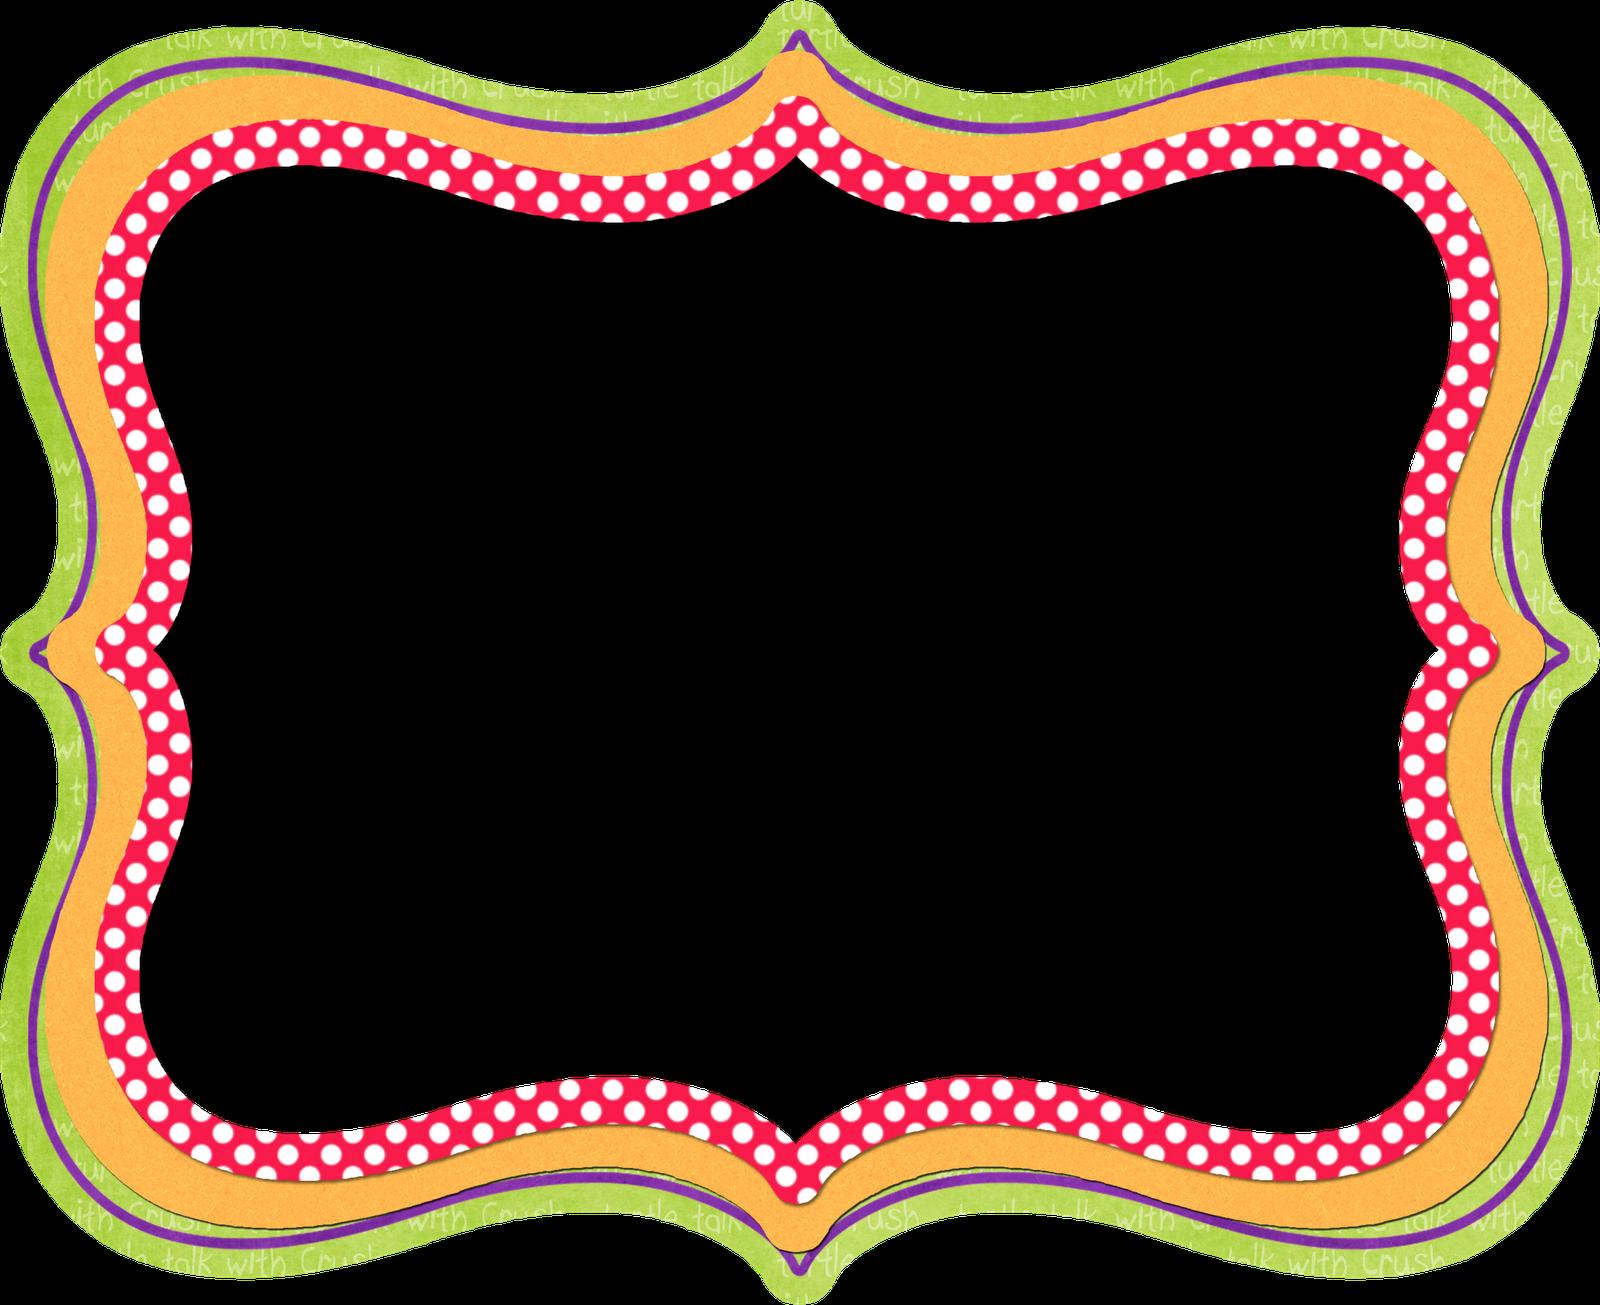 clip download Free printable borders images. Preschool border clipart